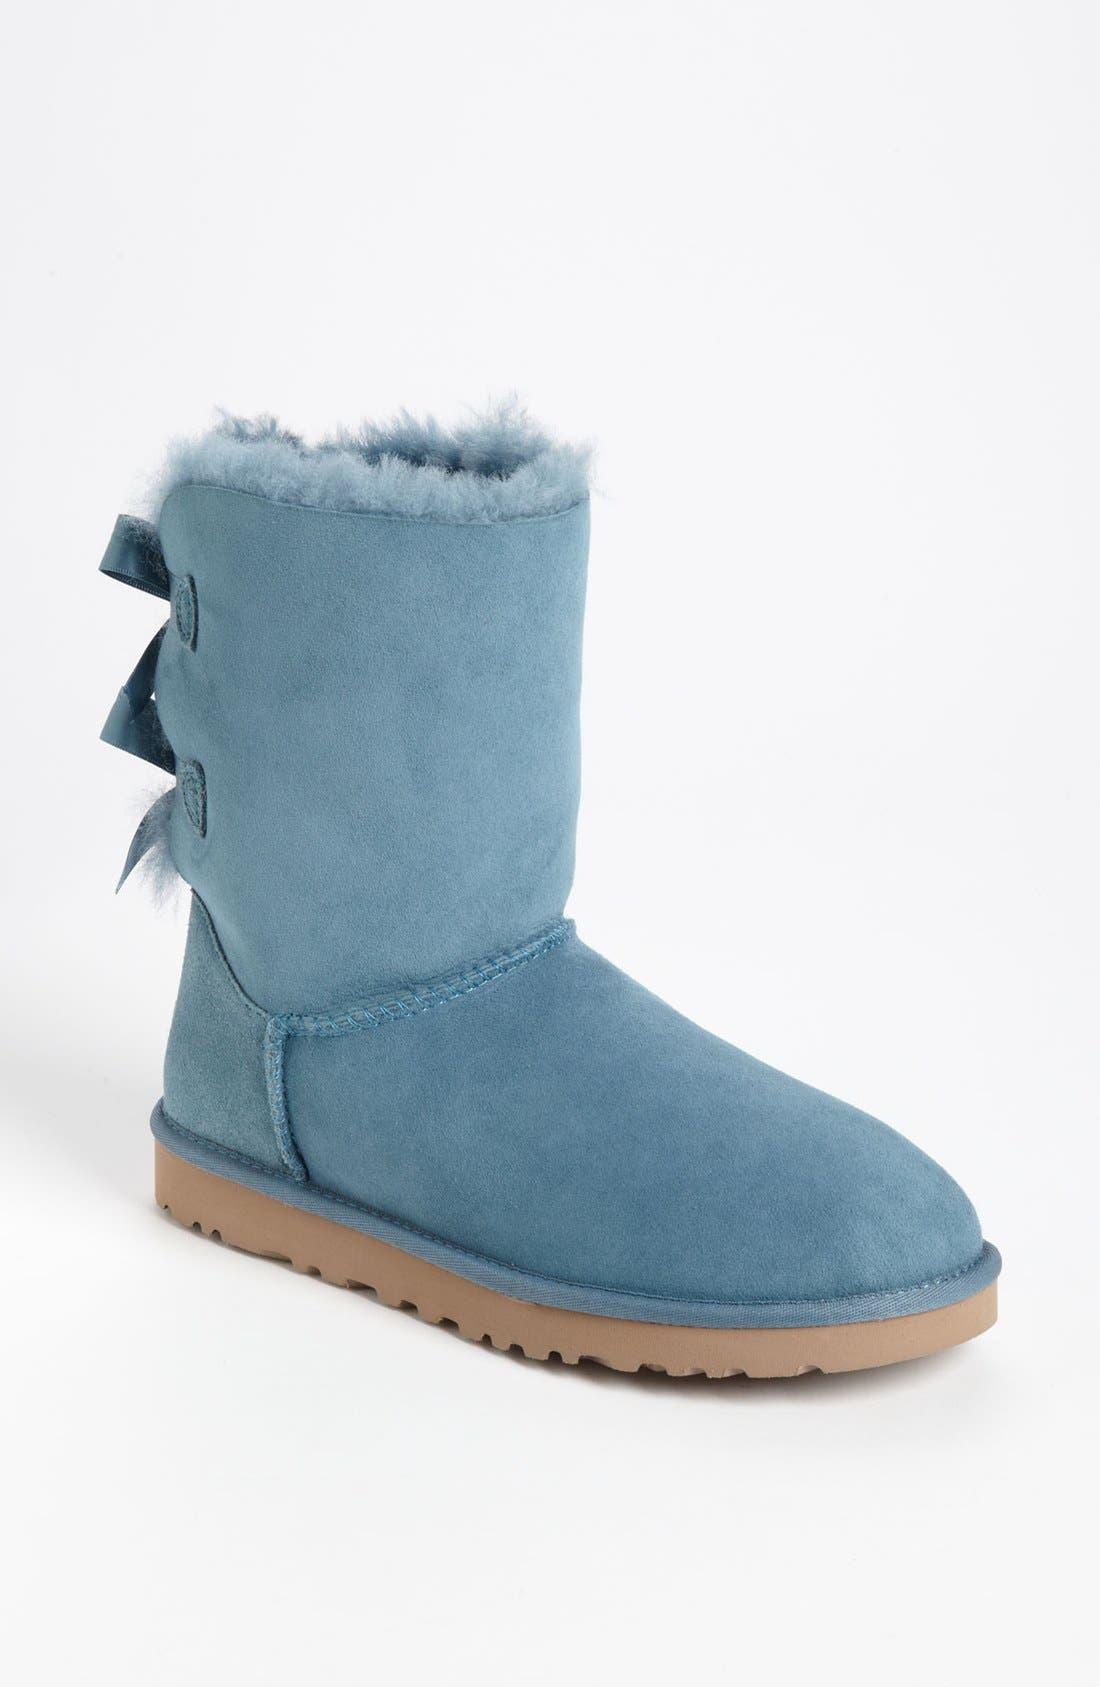 Main Image - UGG® 'Bailey Bow' Boot (Women)